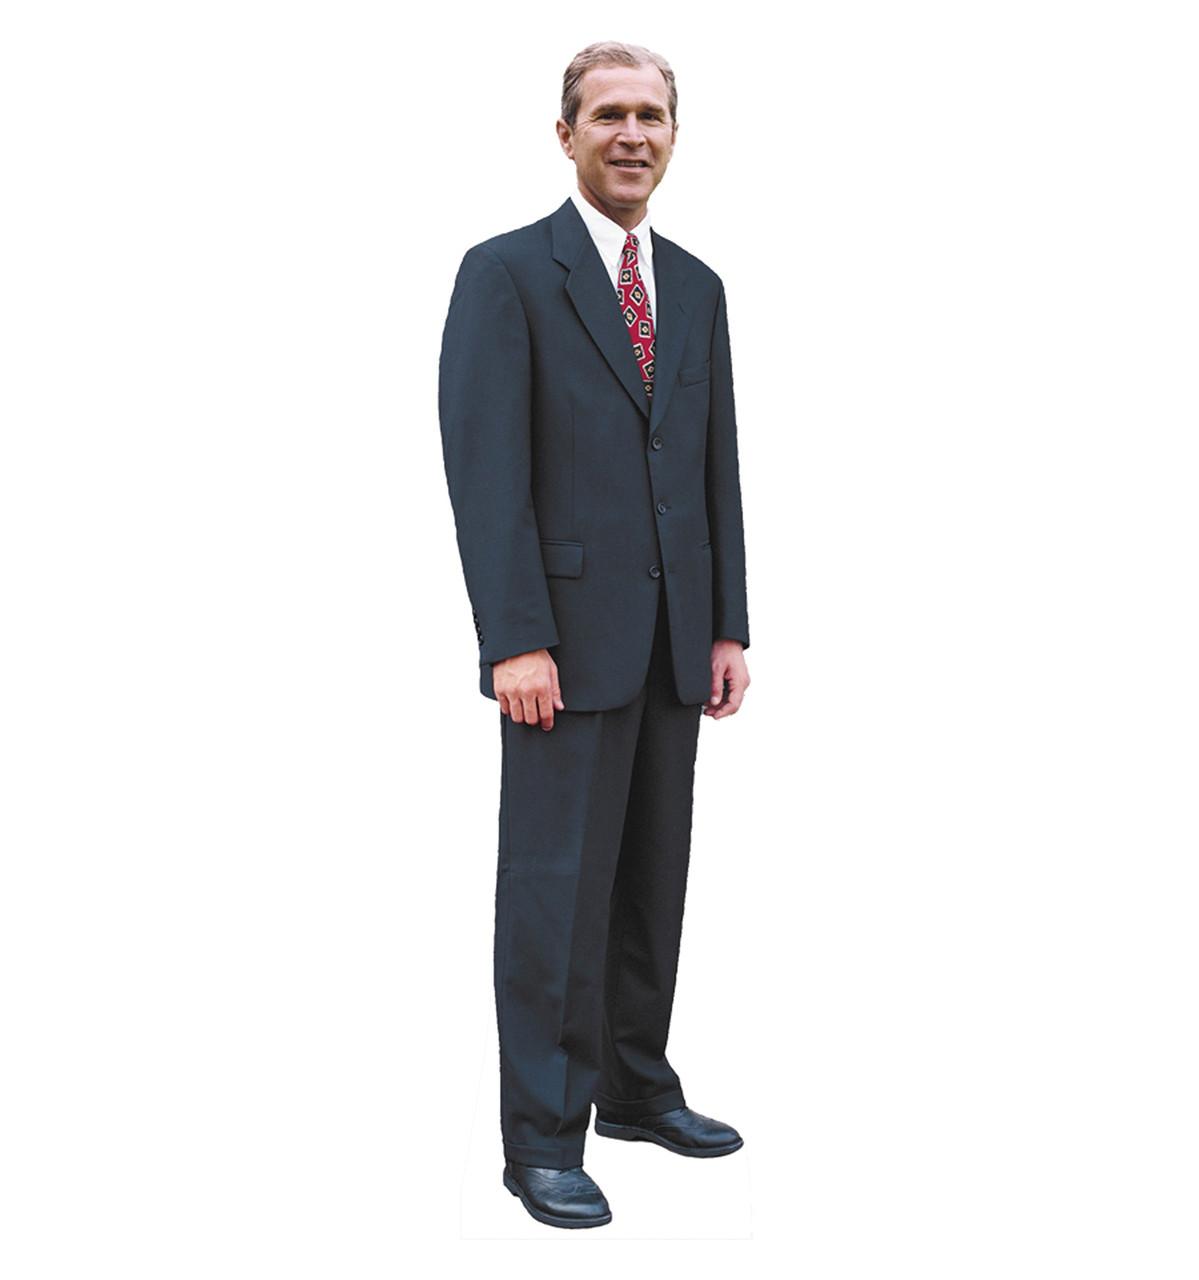 Life-size Pres. George W Bush Cardboard Standup | Cardboard Cutout